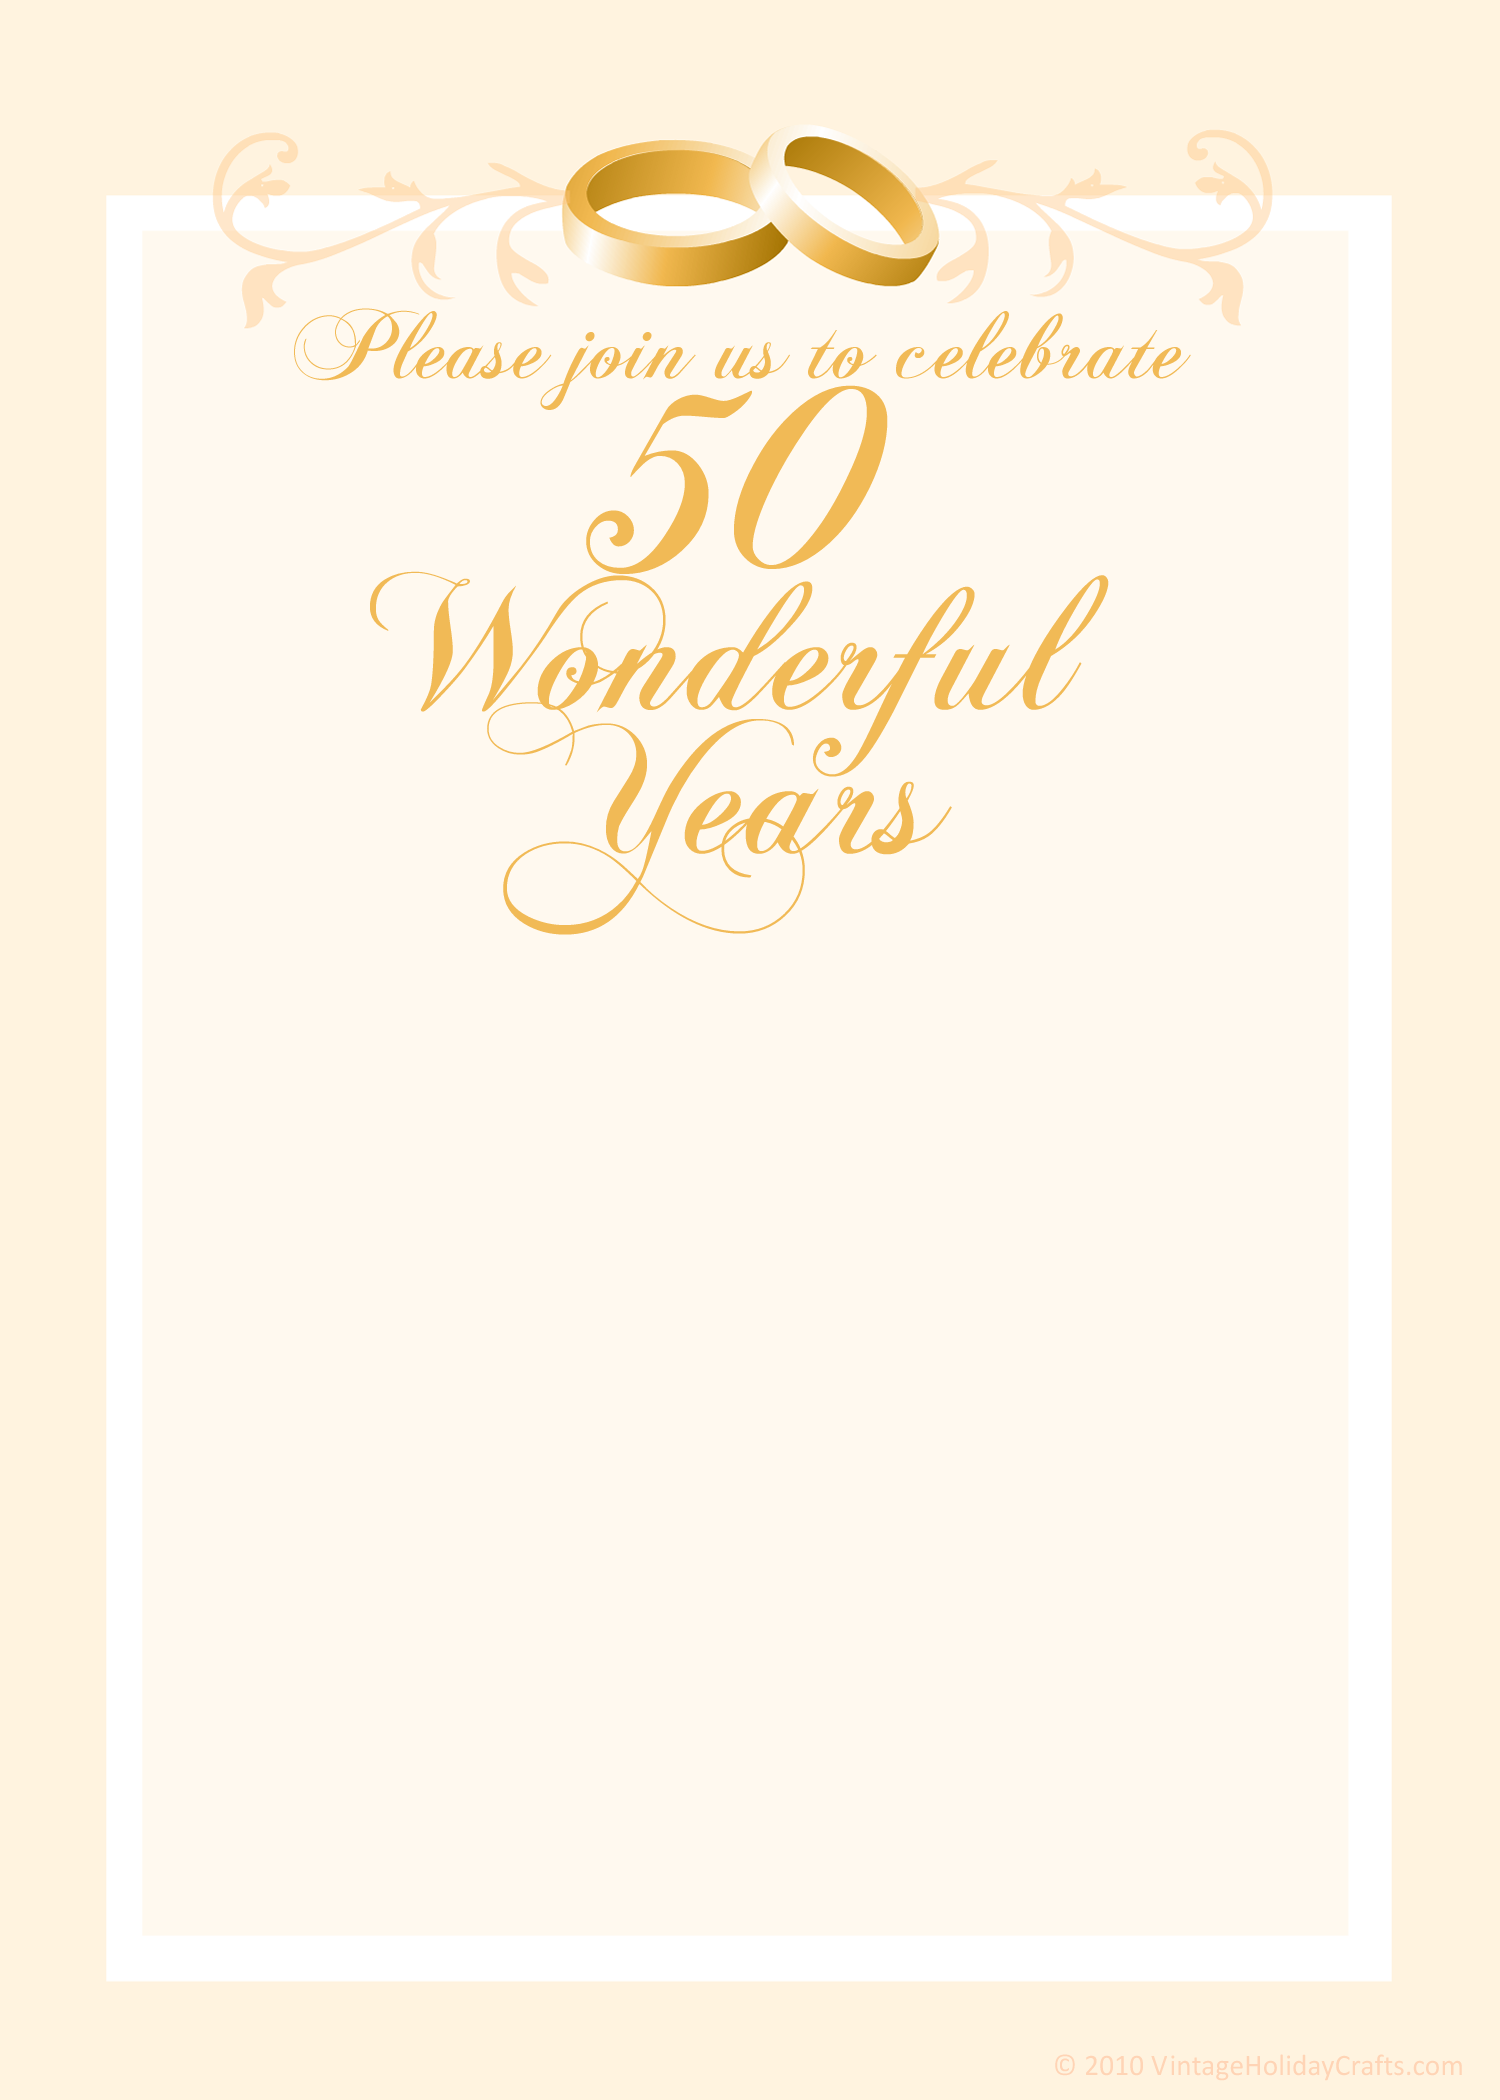 Free 50th Wedding Anniversary Invitations Templates 50th Anniversary Invitations 50th Wedding Anniversary Invitations Anniversary Invitations